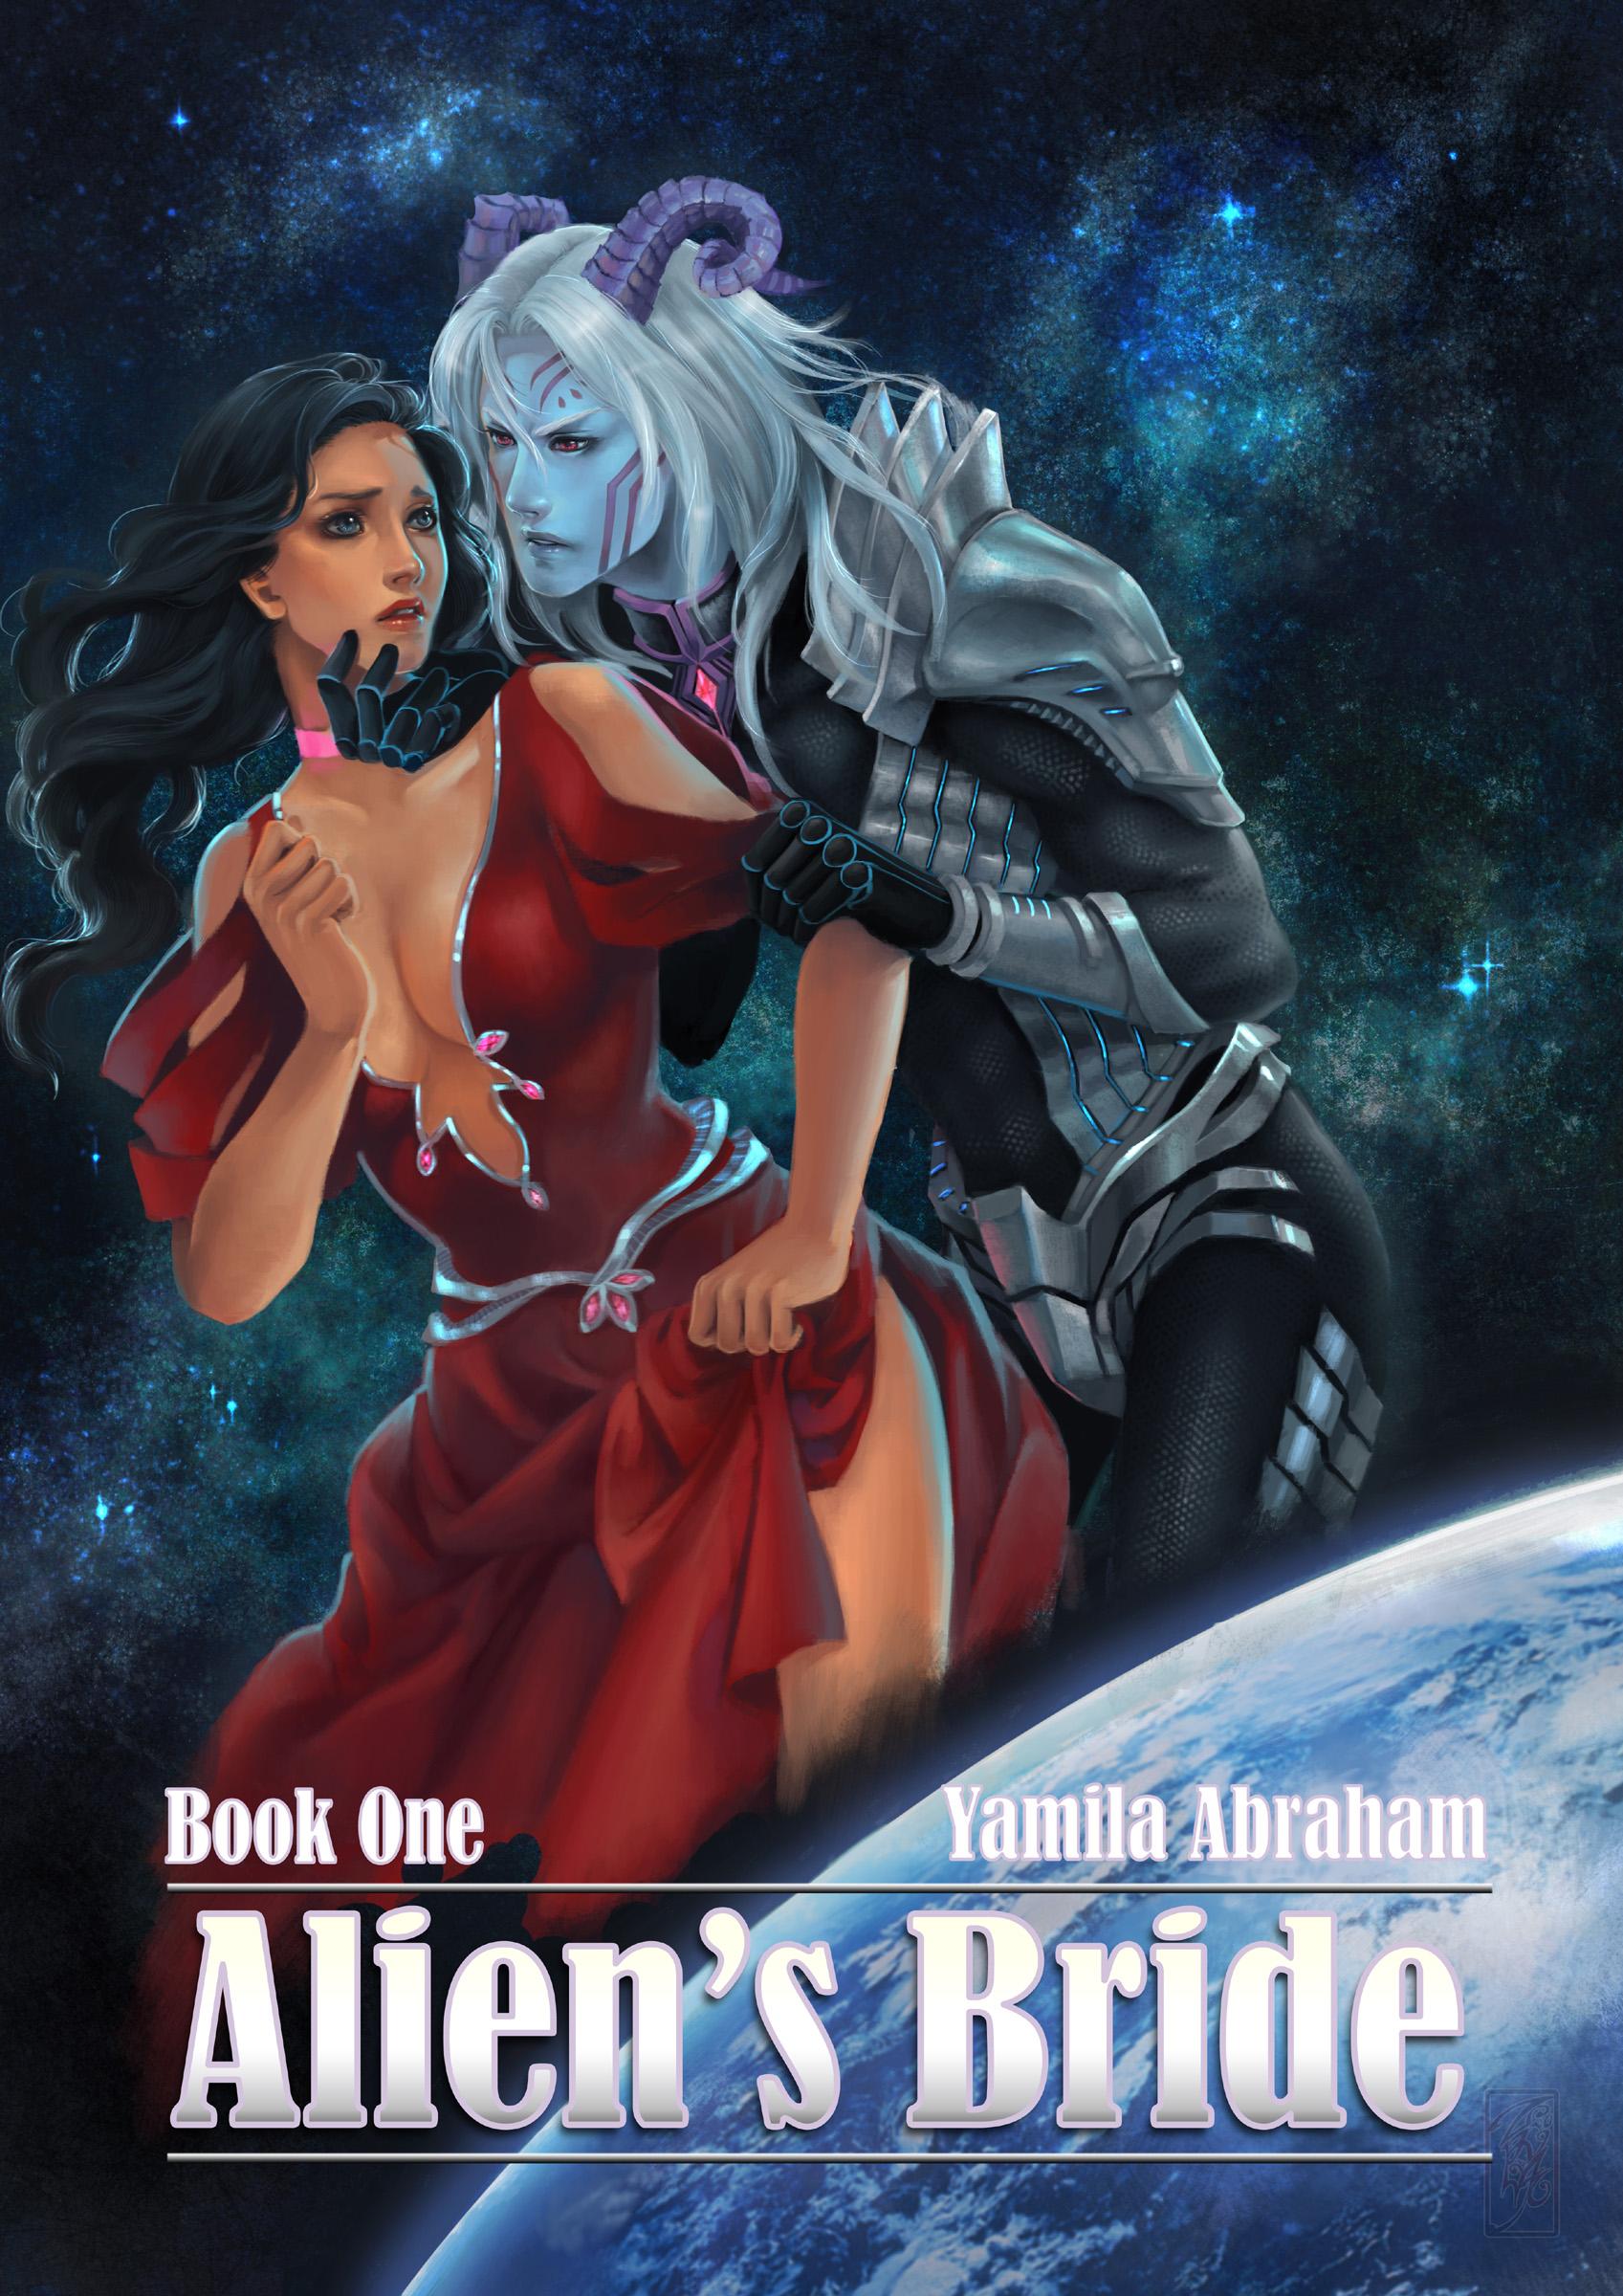 aliens princess bride romance ebook bfrzg